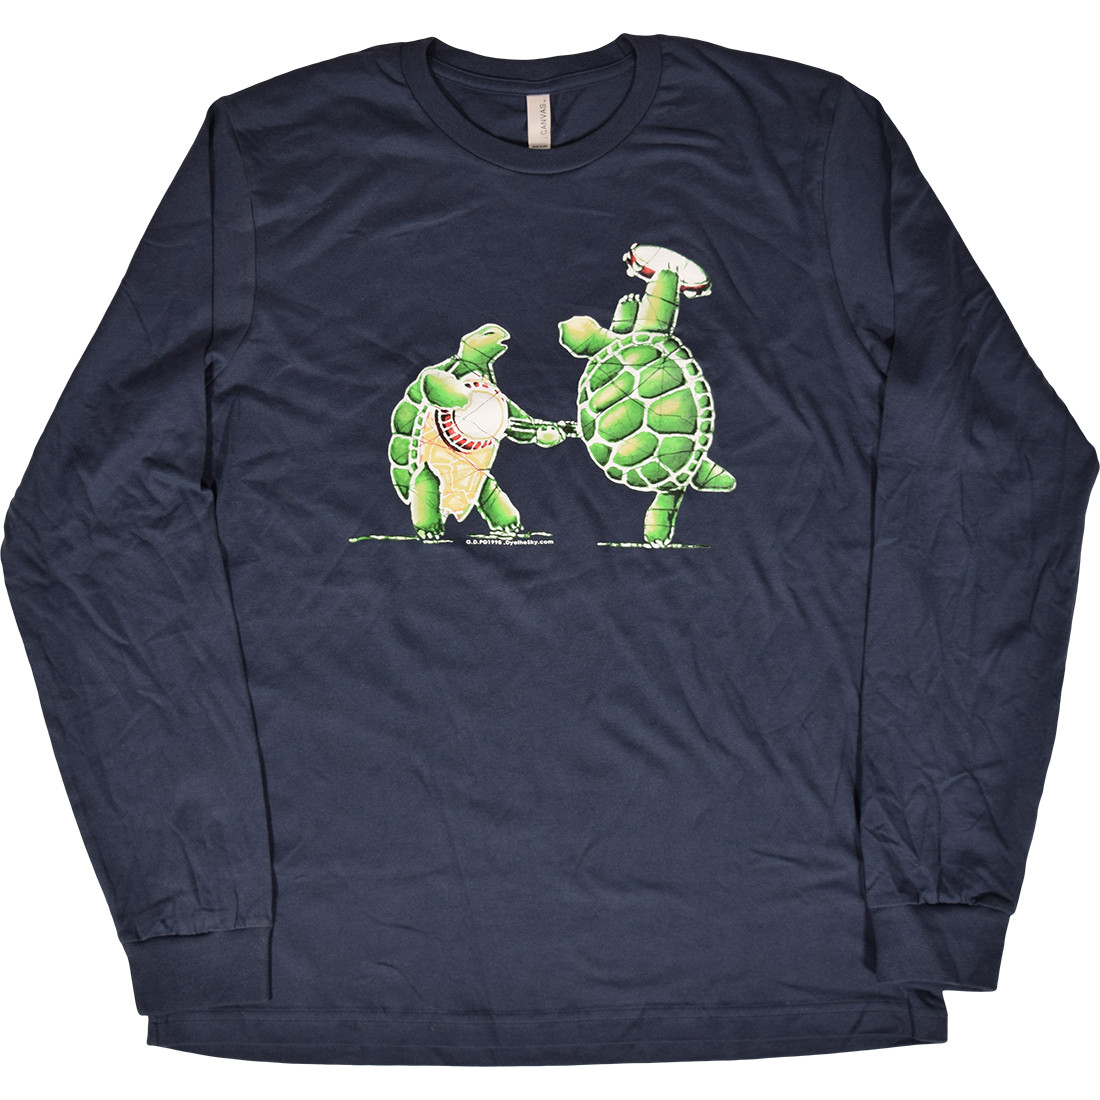 GD Terrapin Station Navy Long Sleeve T-Shirt